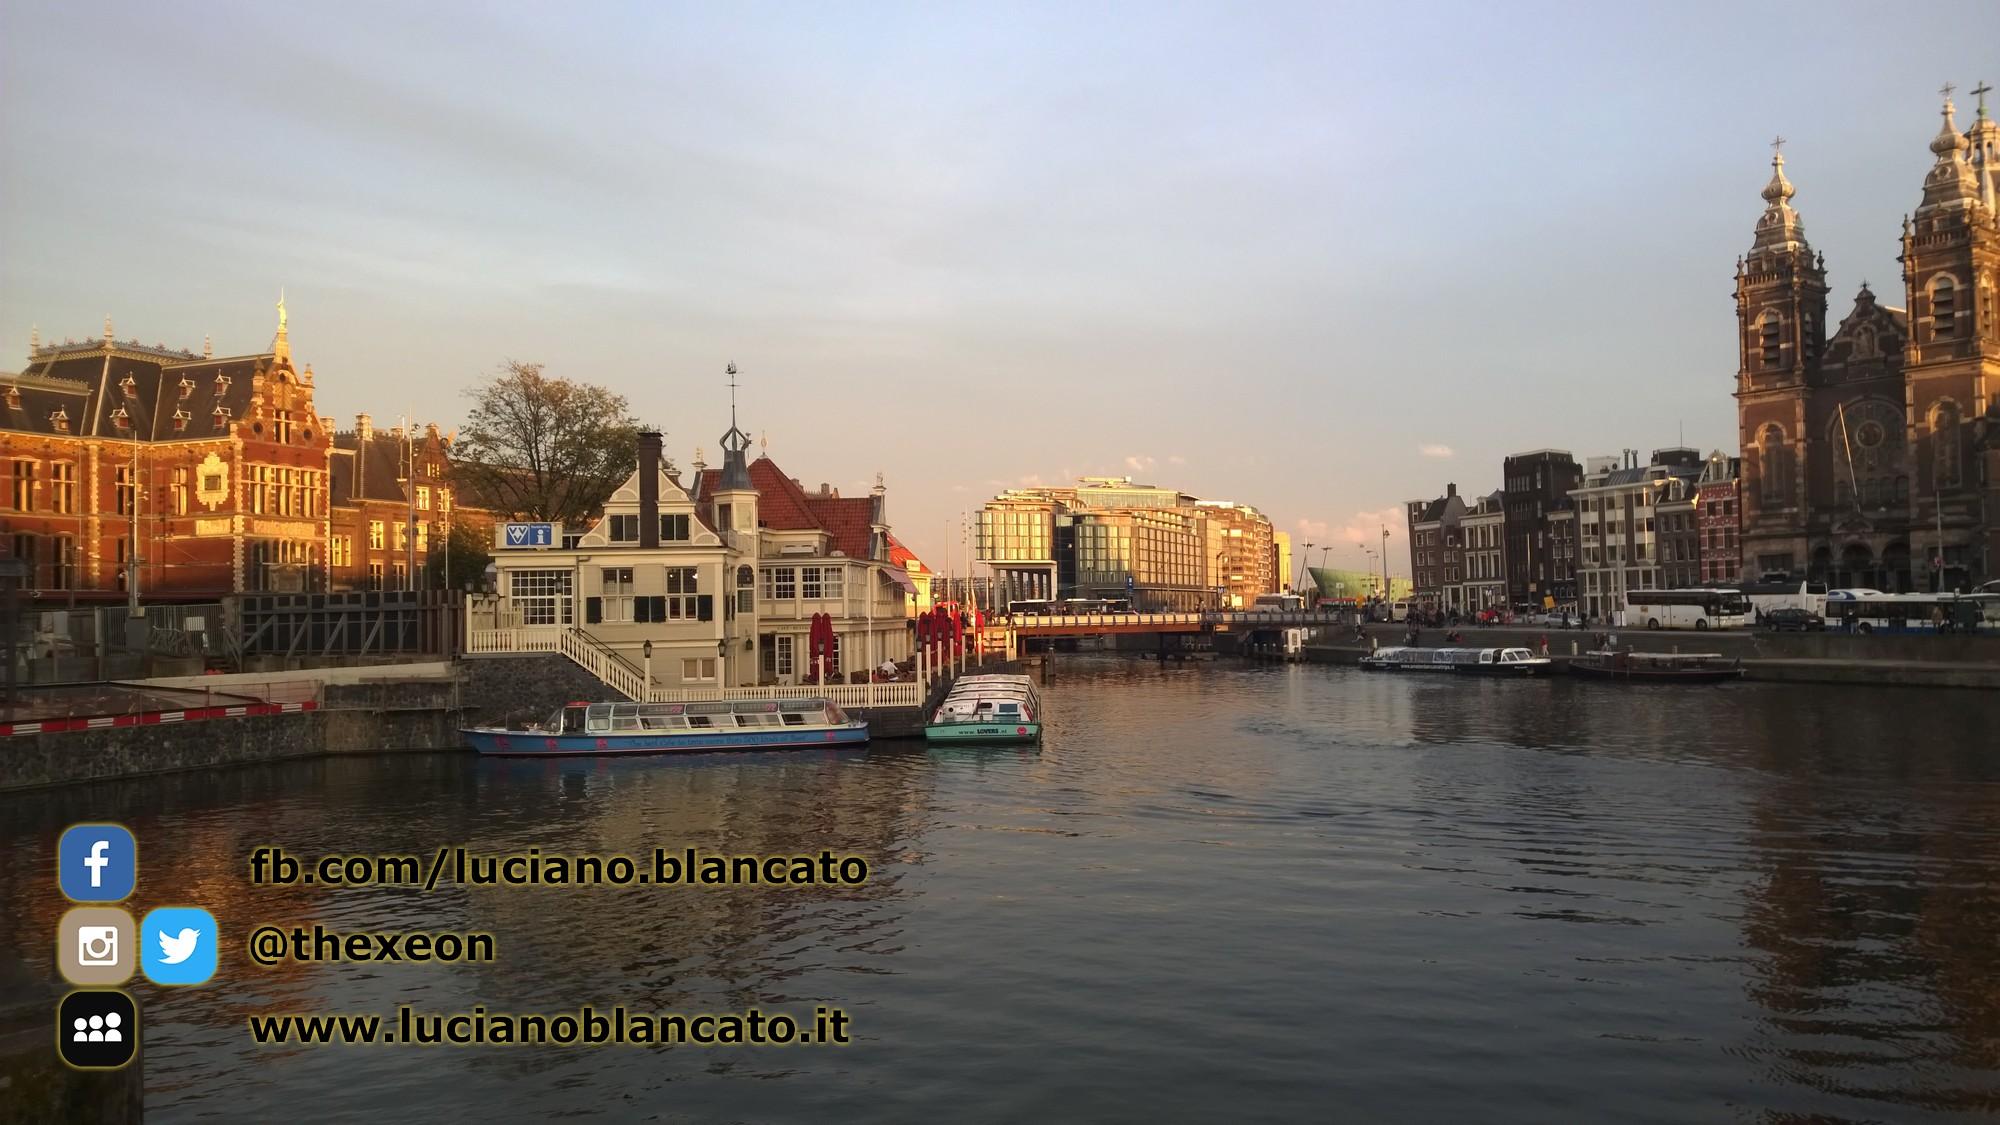 Amsterdam - Basilica di San Nicola - Sint-Nicolaaskerk e canali